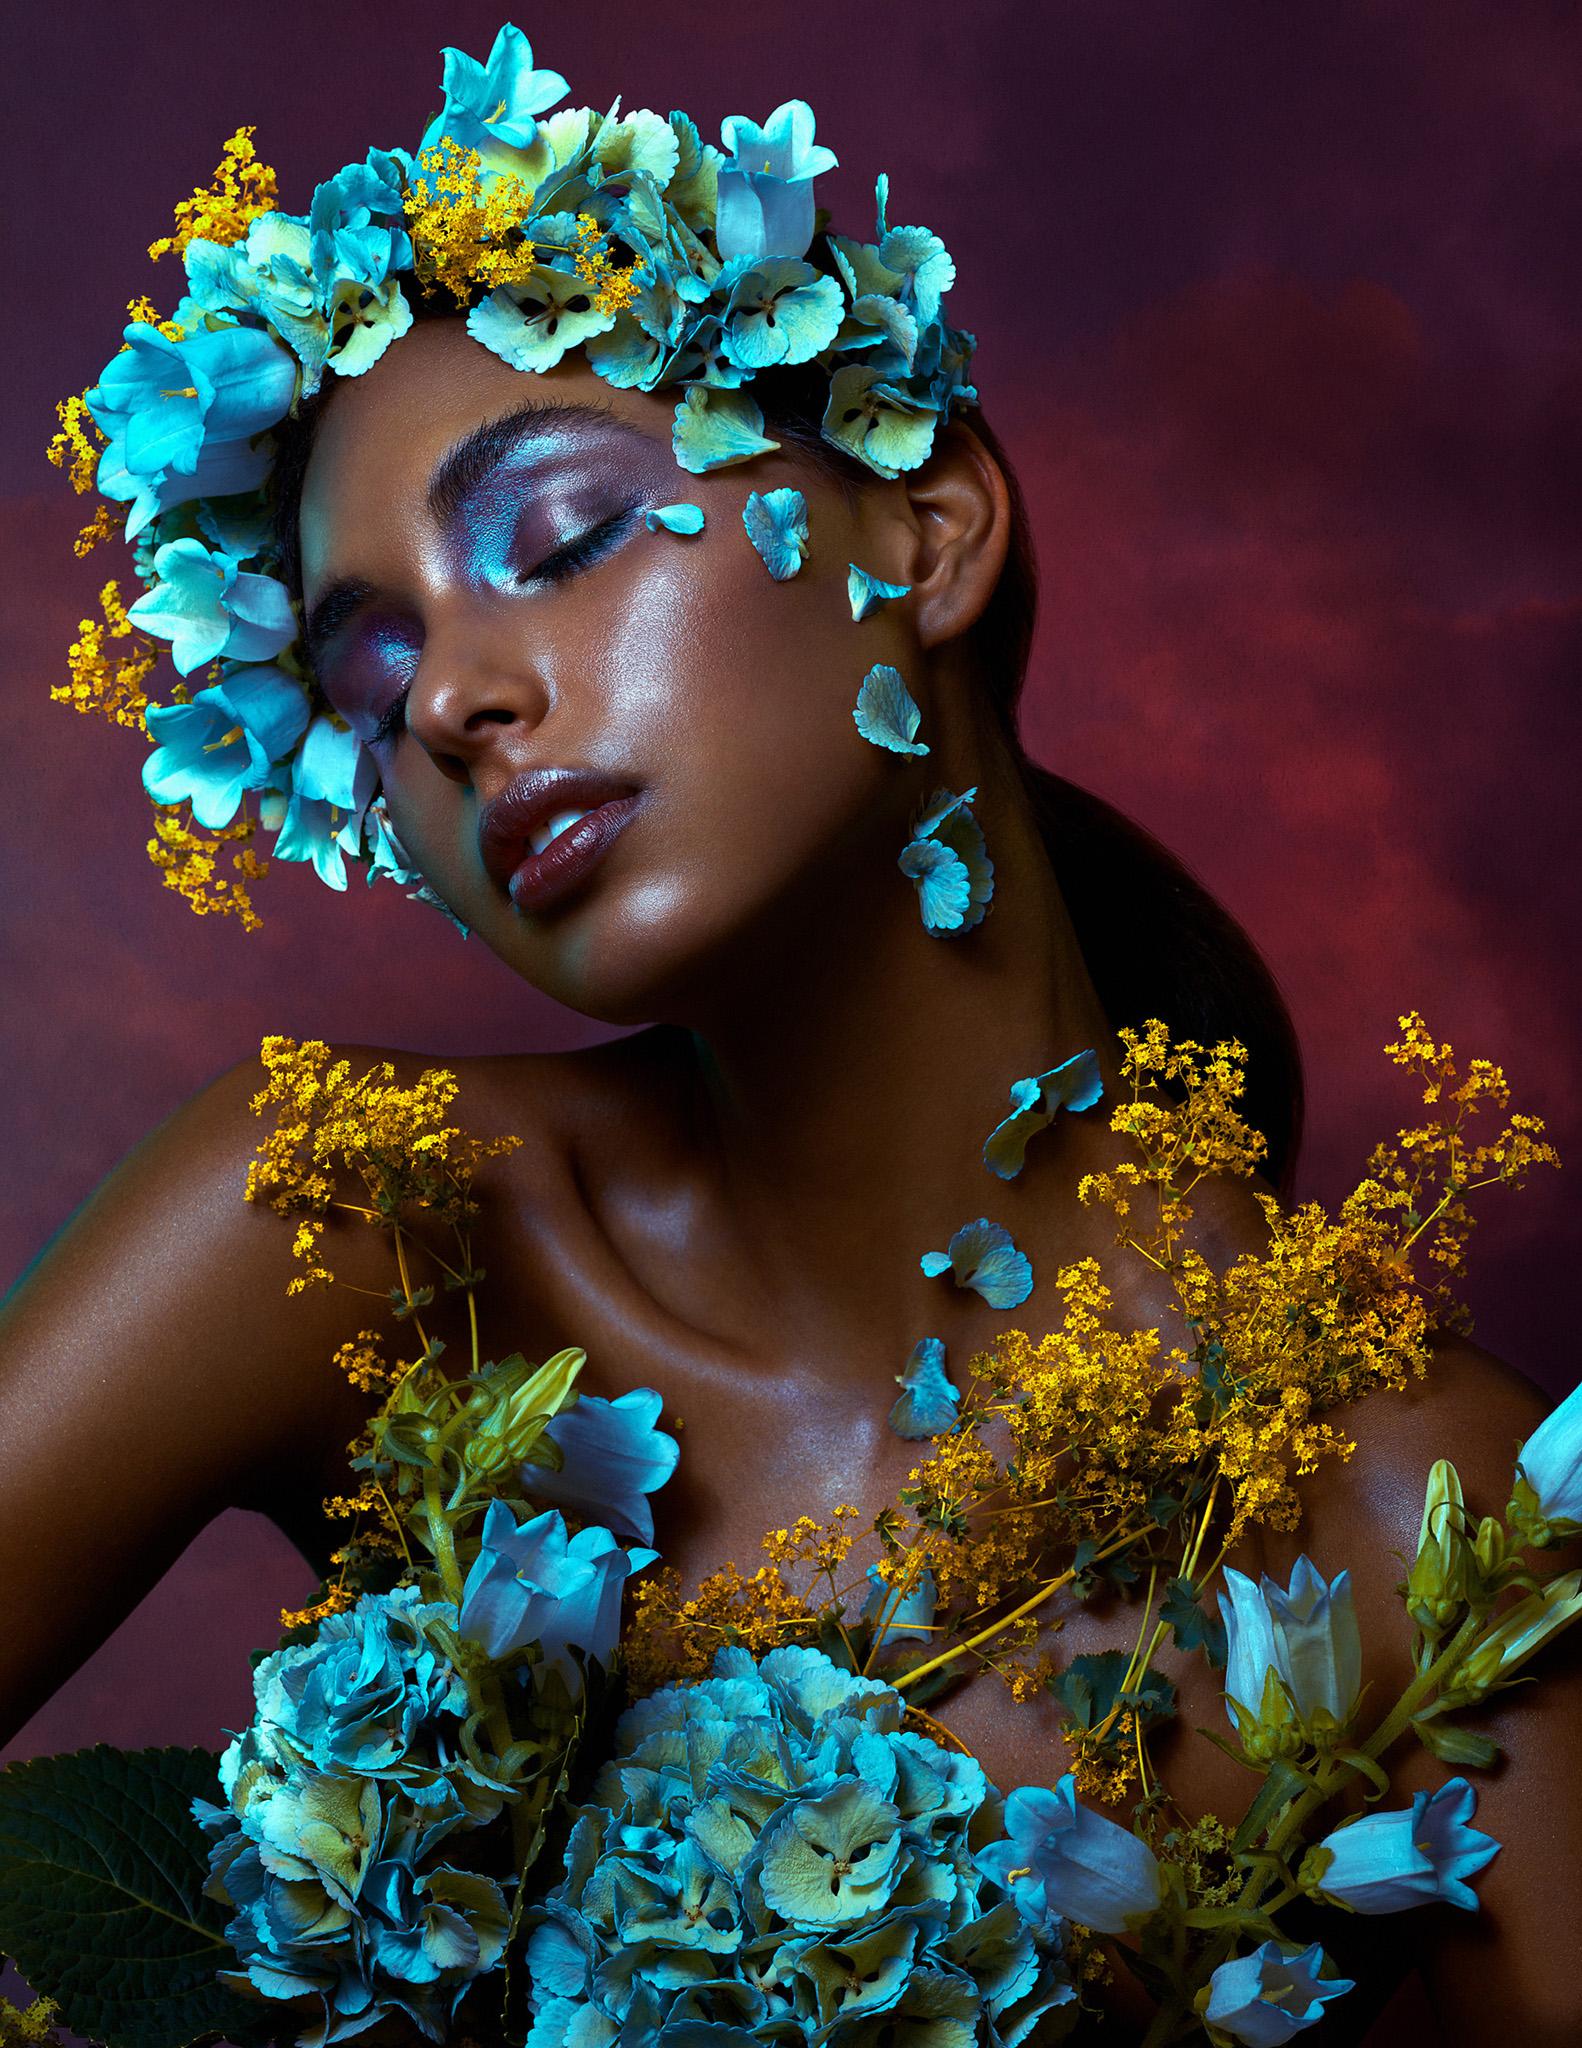 bella-kotak-phase-one-phaseone-profoto-lucysmagazine-profoto-solstice-retouch-beauty-editorial-fashion-mac-cosmetics-glitter-eyes-flower-hydrangea-4